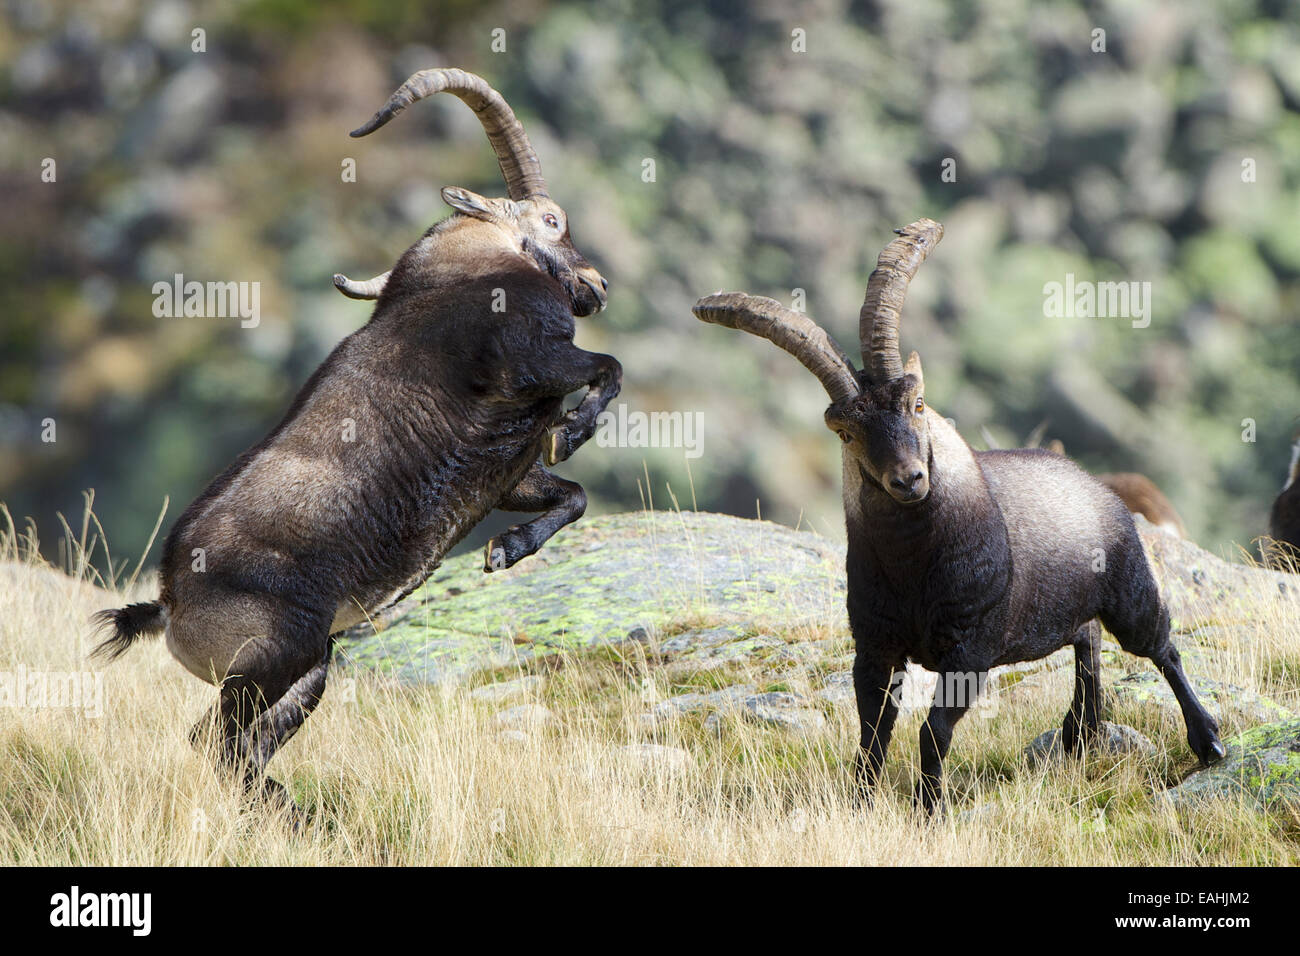 Una impresionante lucha entre dos cabras de montaña totalmente crecido, o español Ibex, lleno de tensión Imagen De Stock